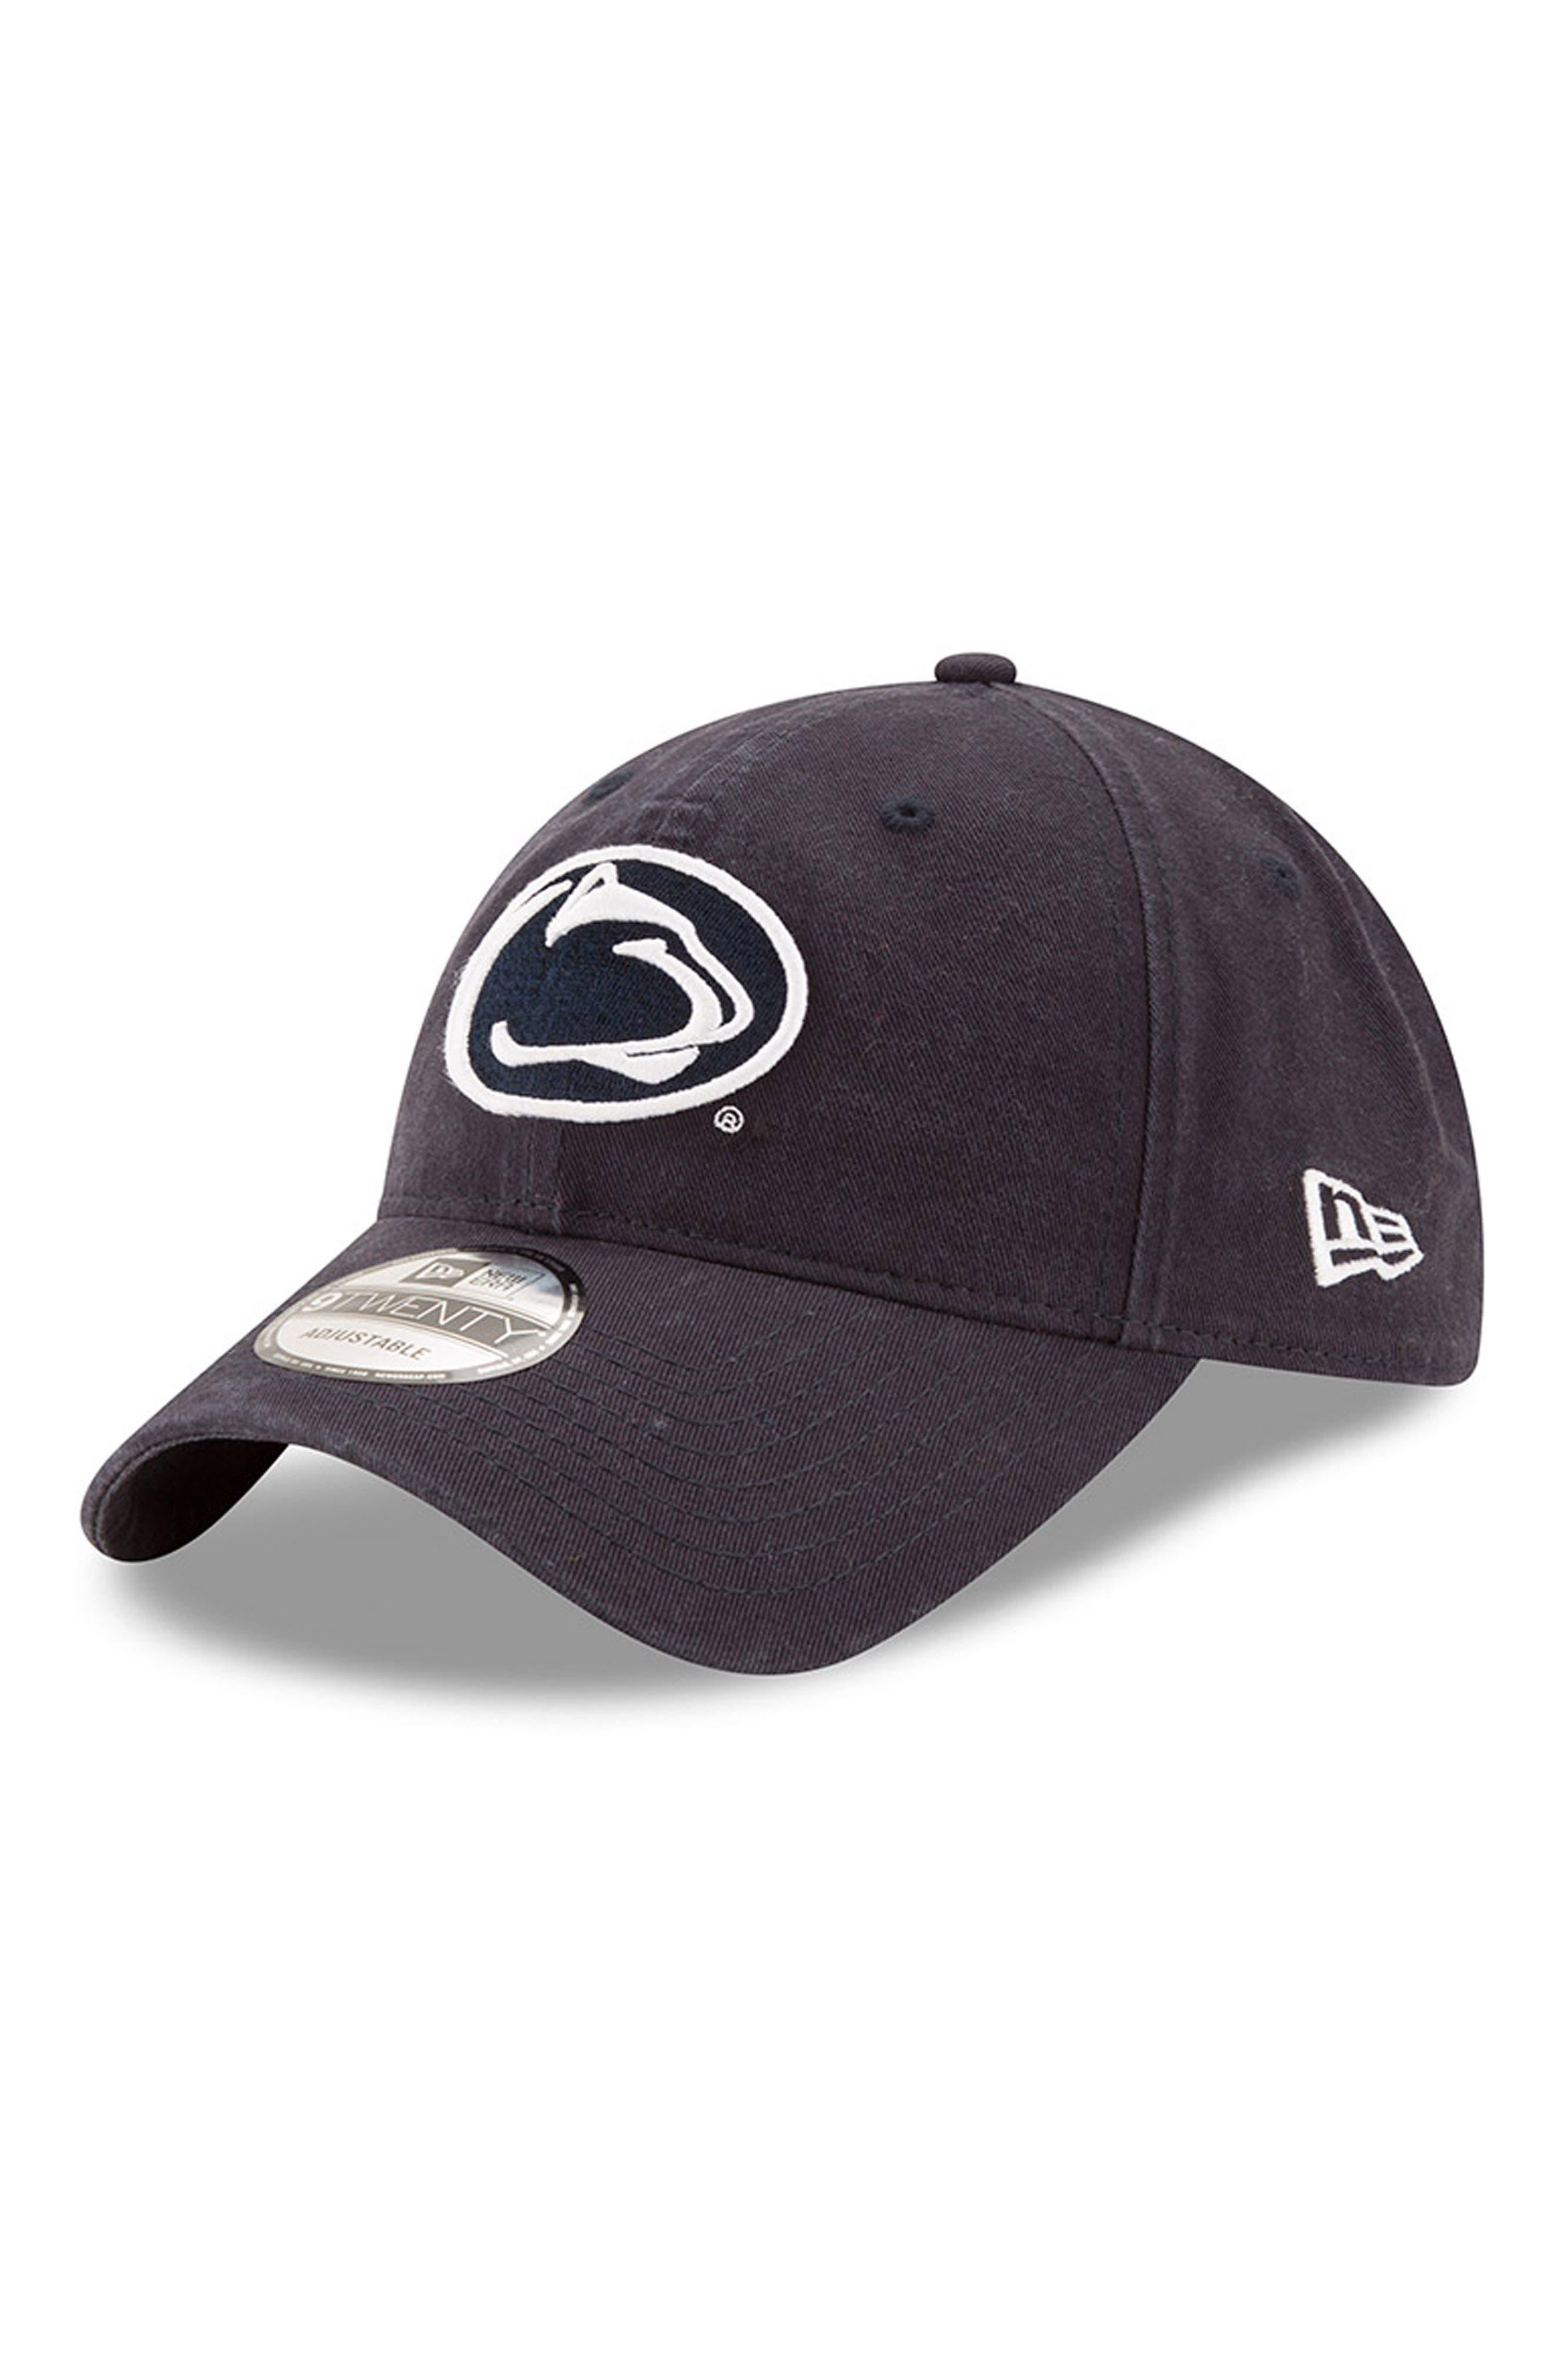 New Era Collegiate Core Classic - Penn State Nittany Lions Baseball Cap